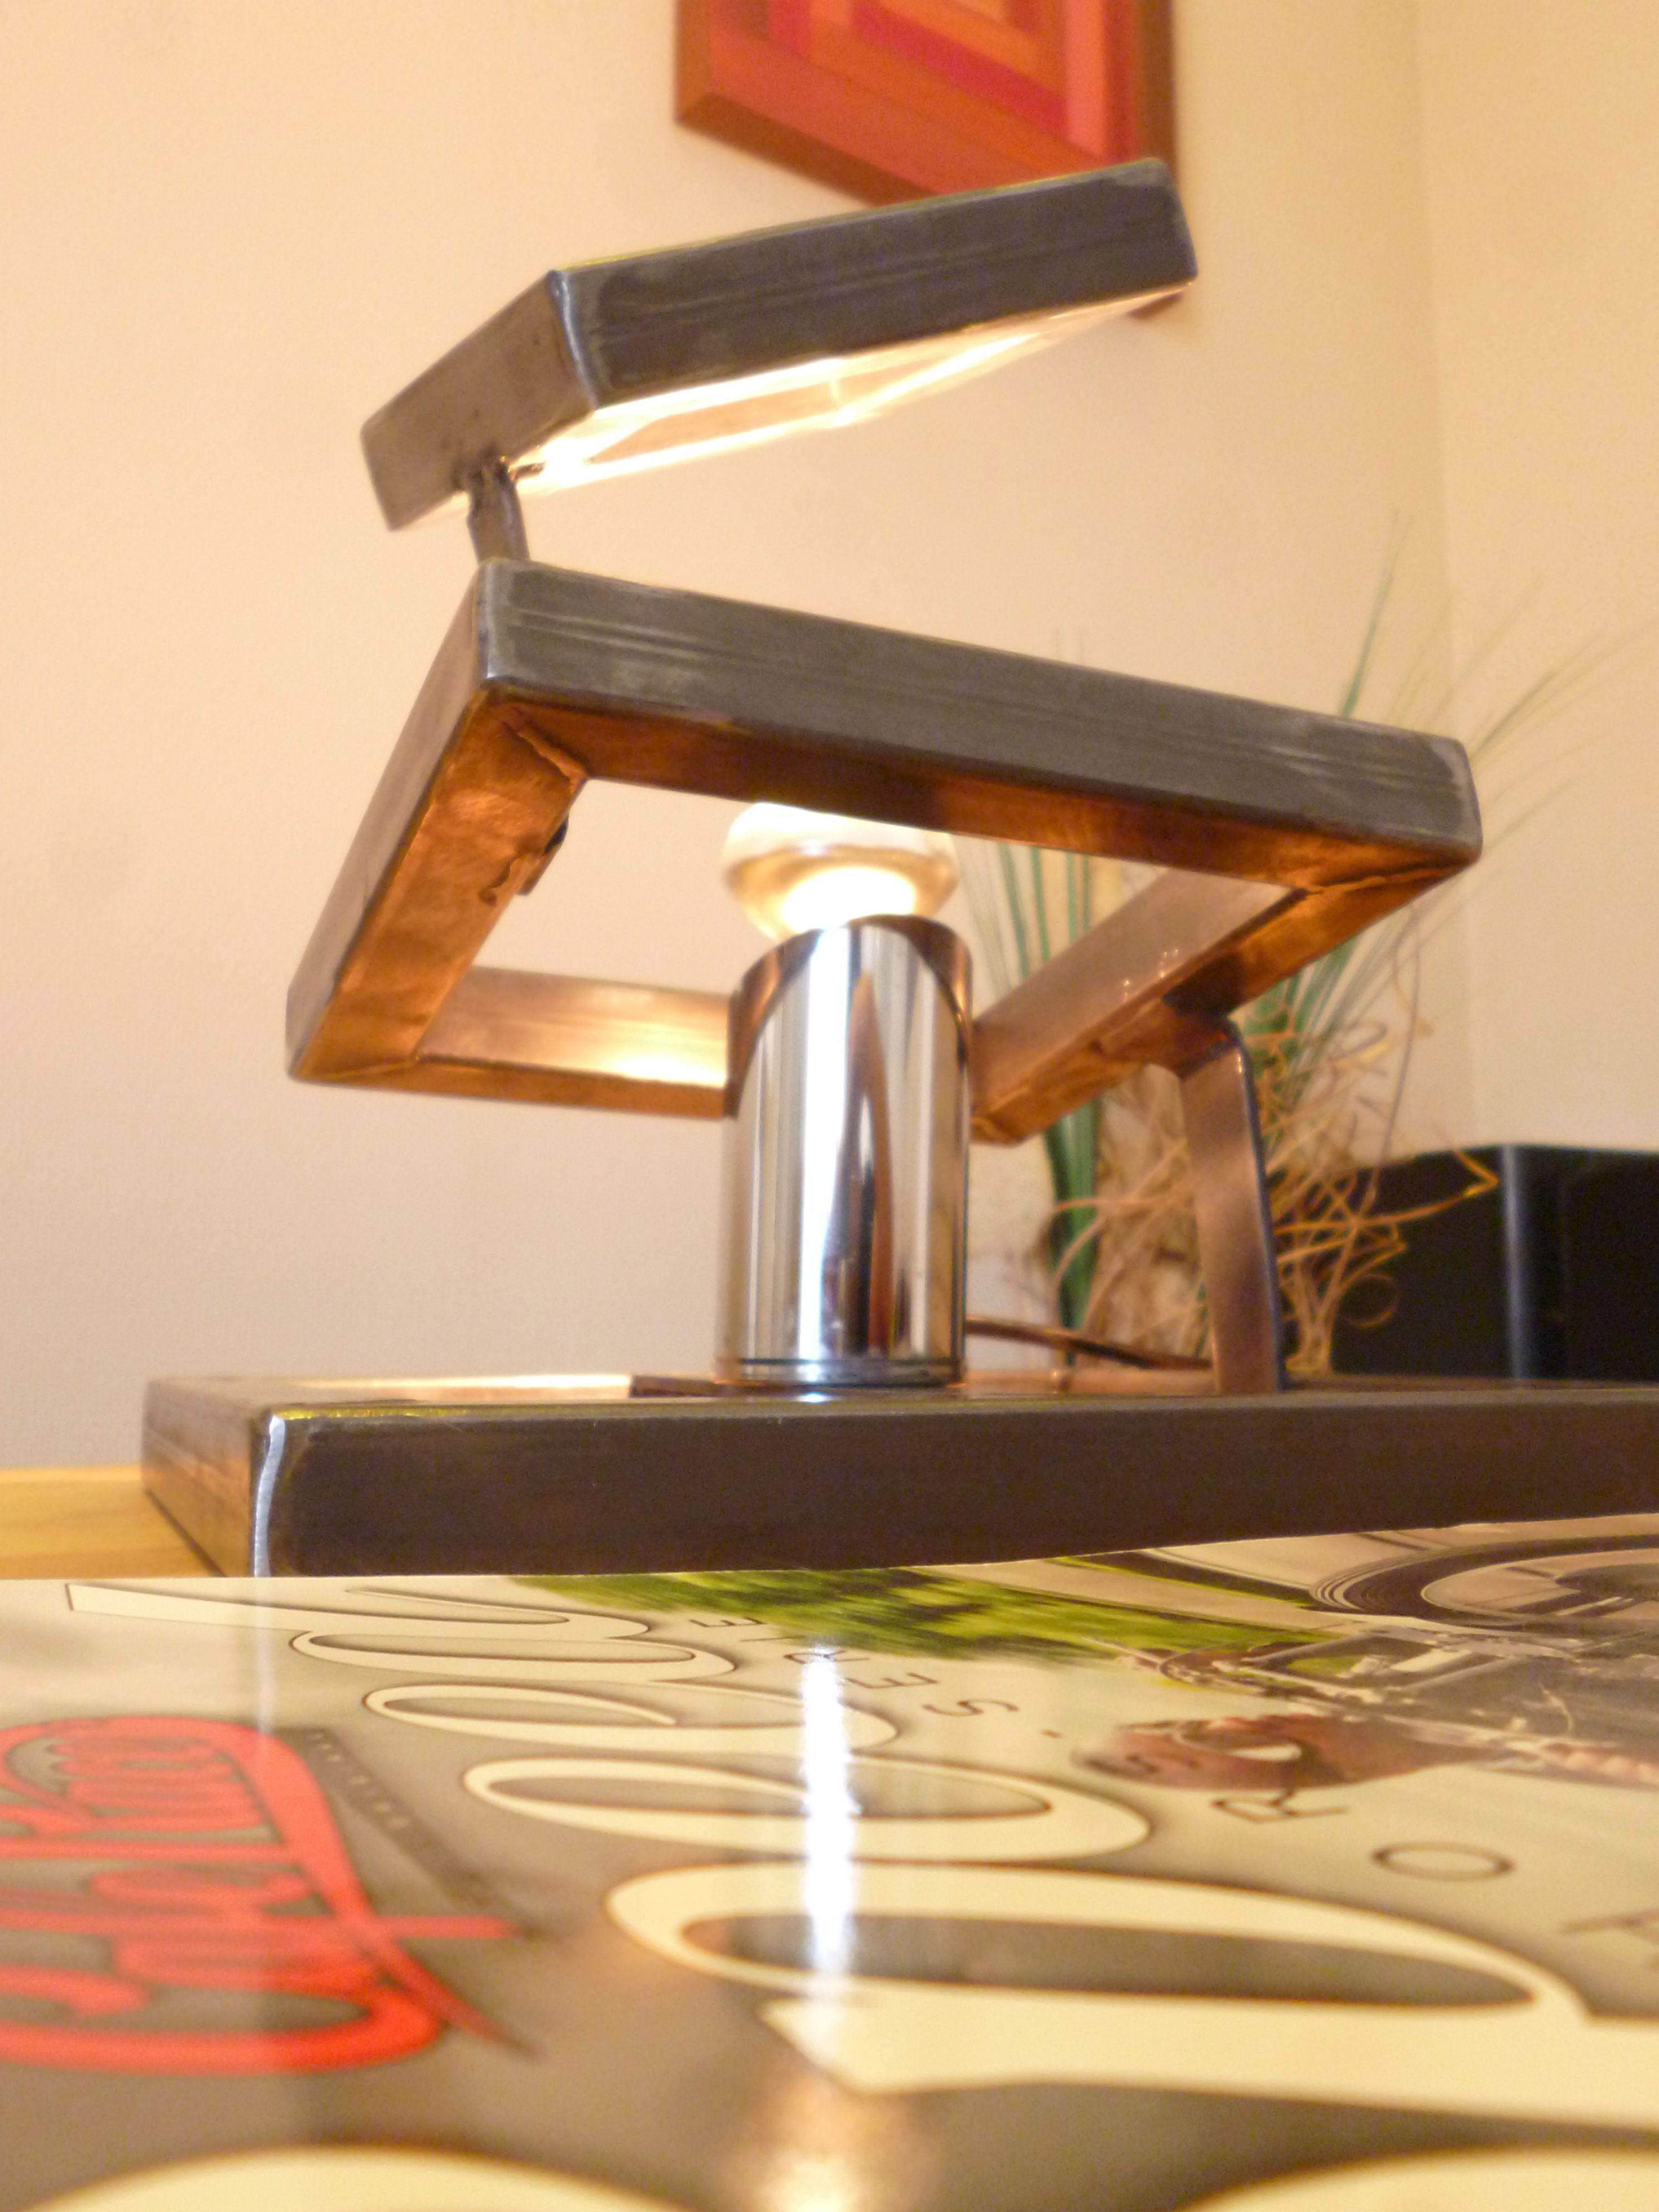 de320b4881da1f95e895d61818dc5838 Faszinierend Up Down Lampe Dekorationen